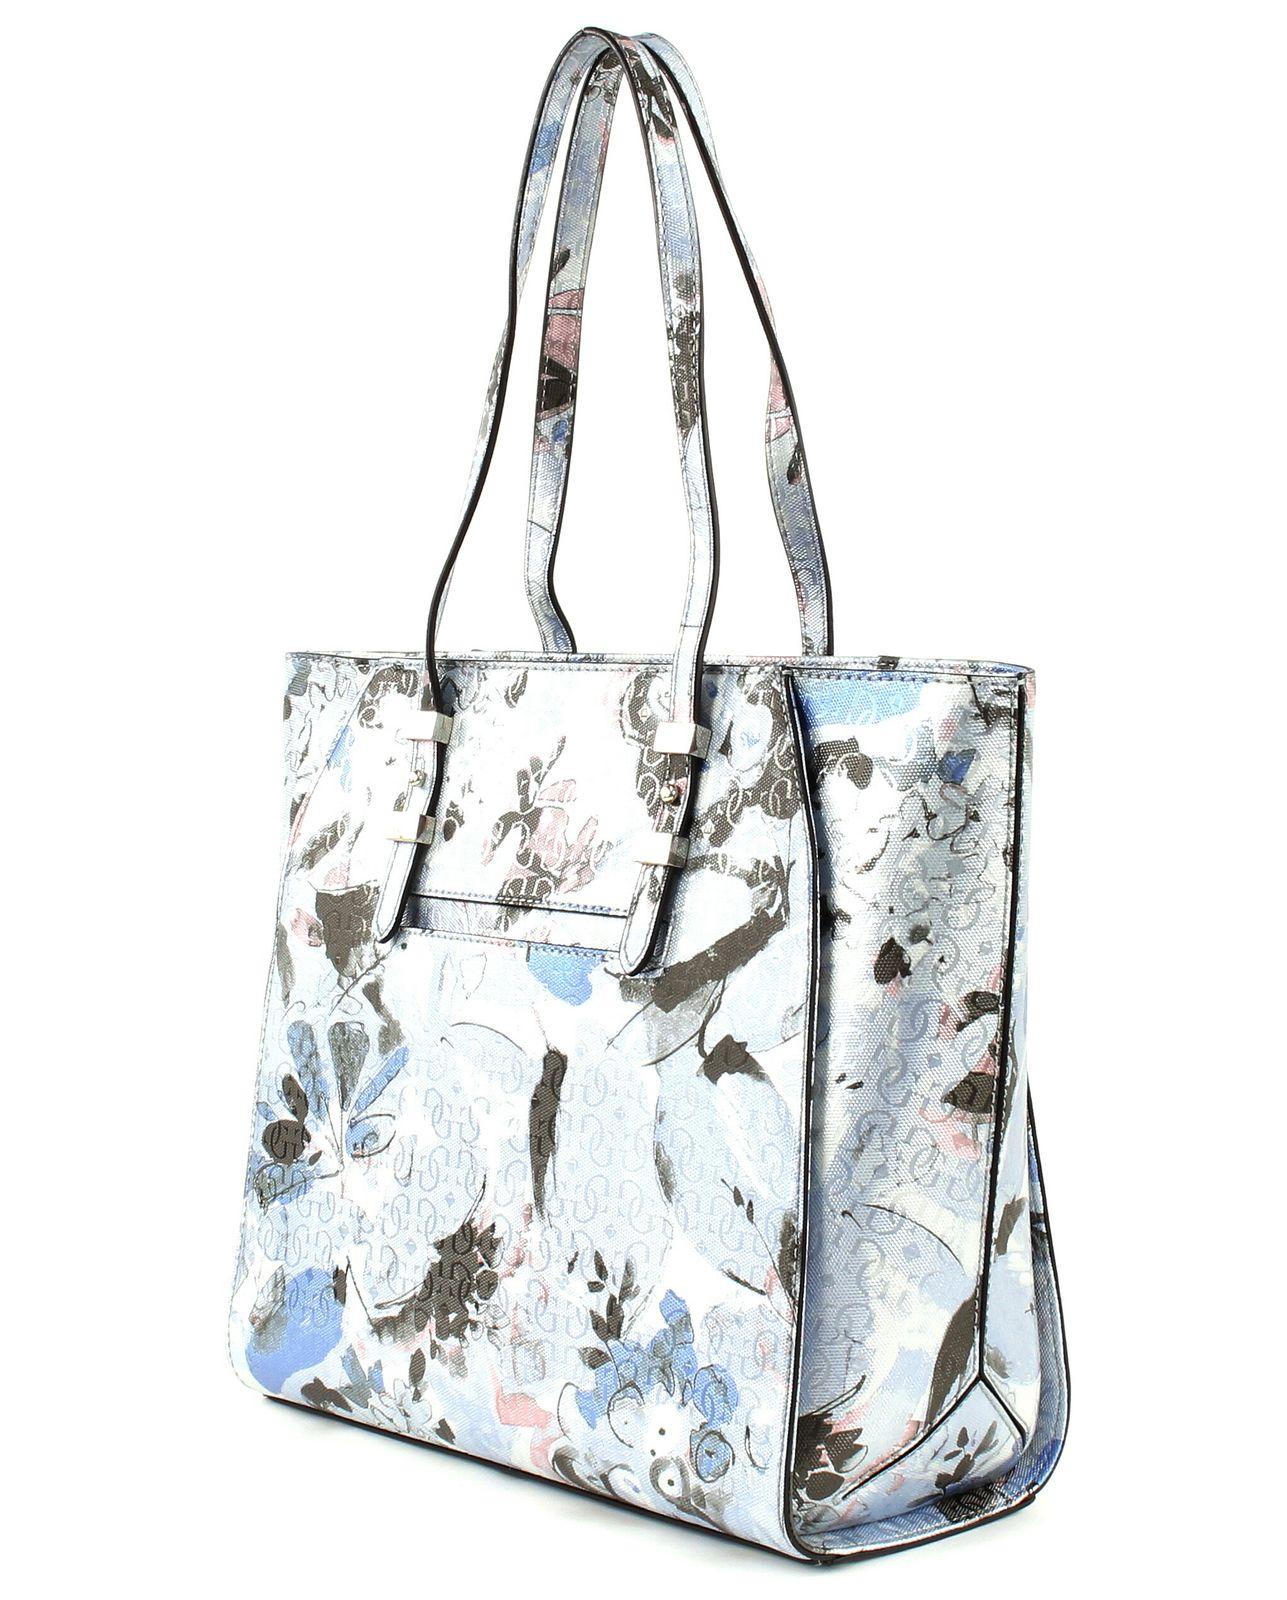 GUESS Shoulder Bag Gia Tote Blue Floral